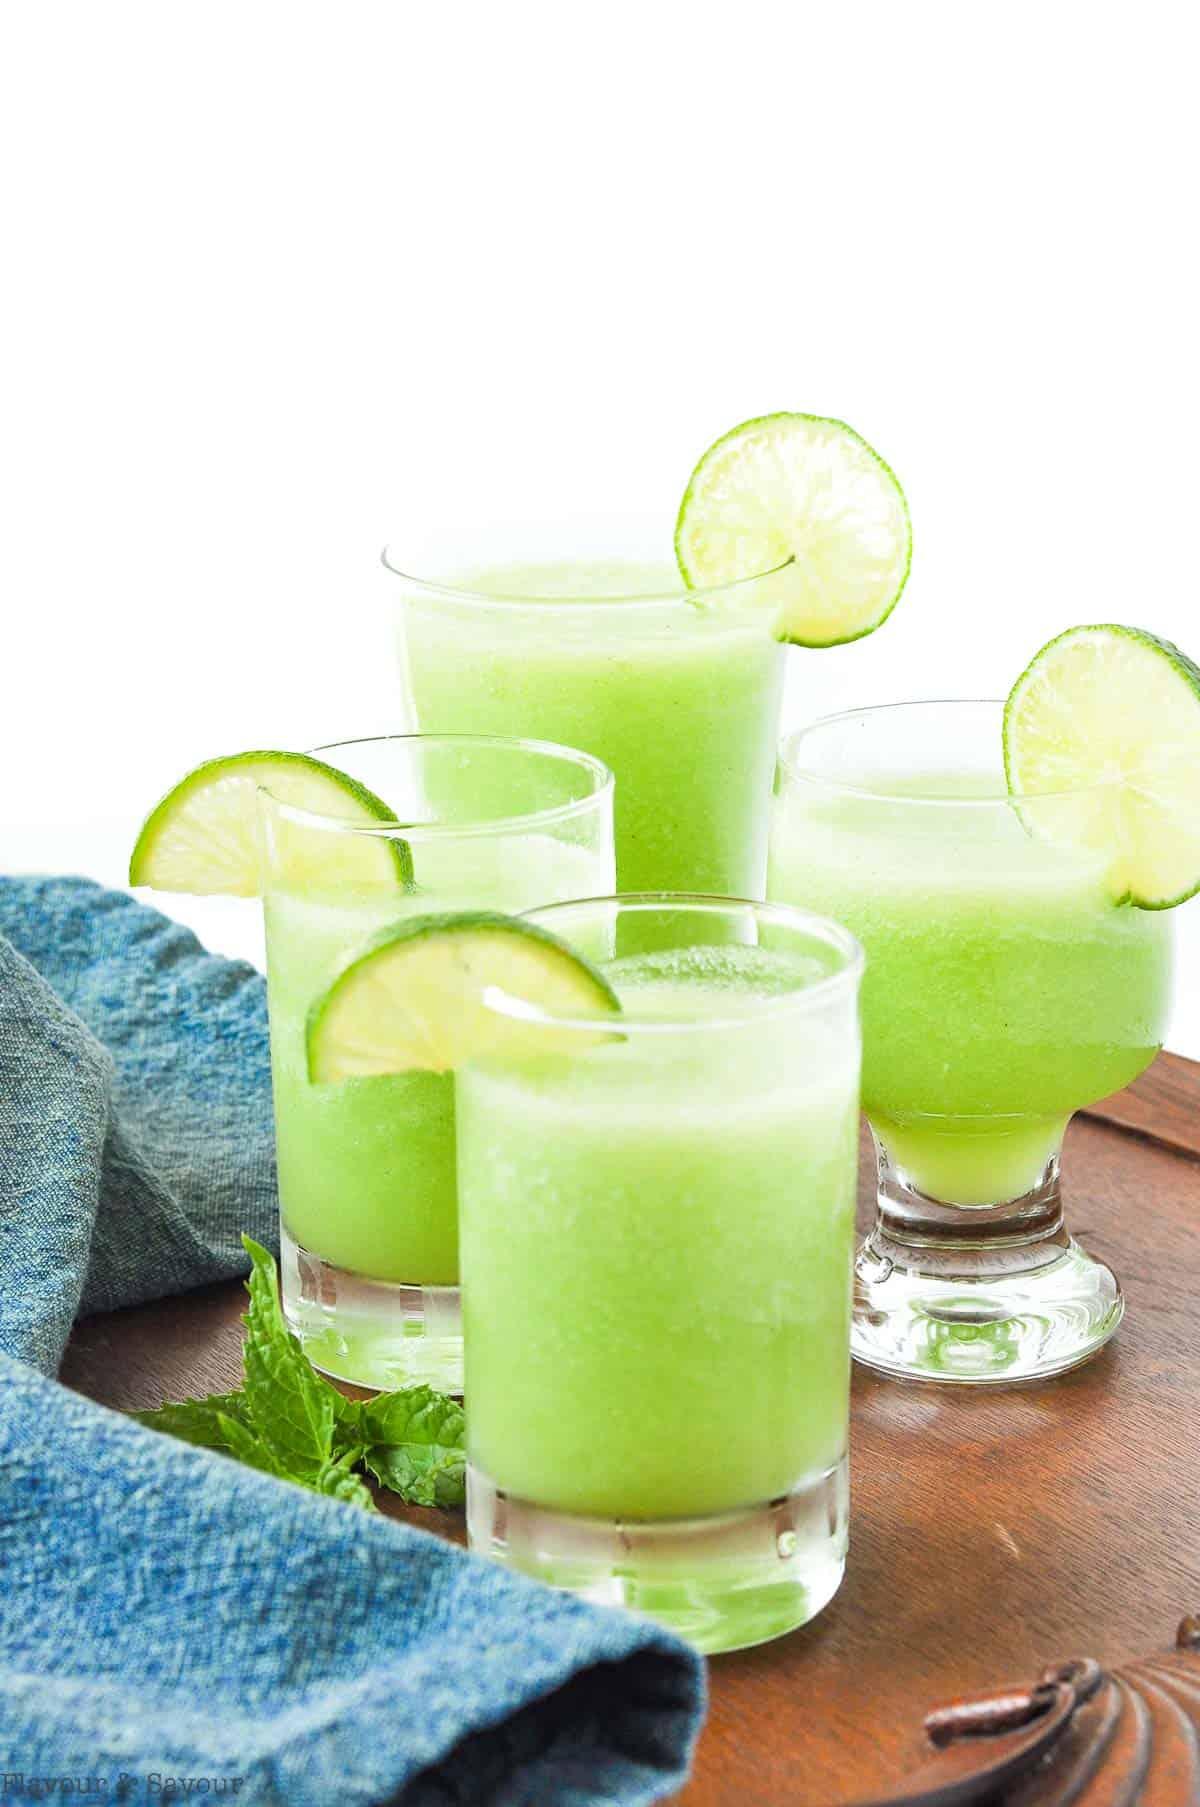 Four glasses of Honeydew Lime mocktail garnished with lime slices